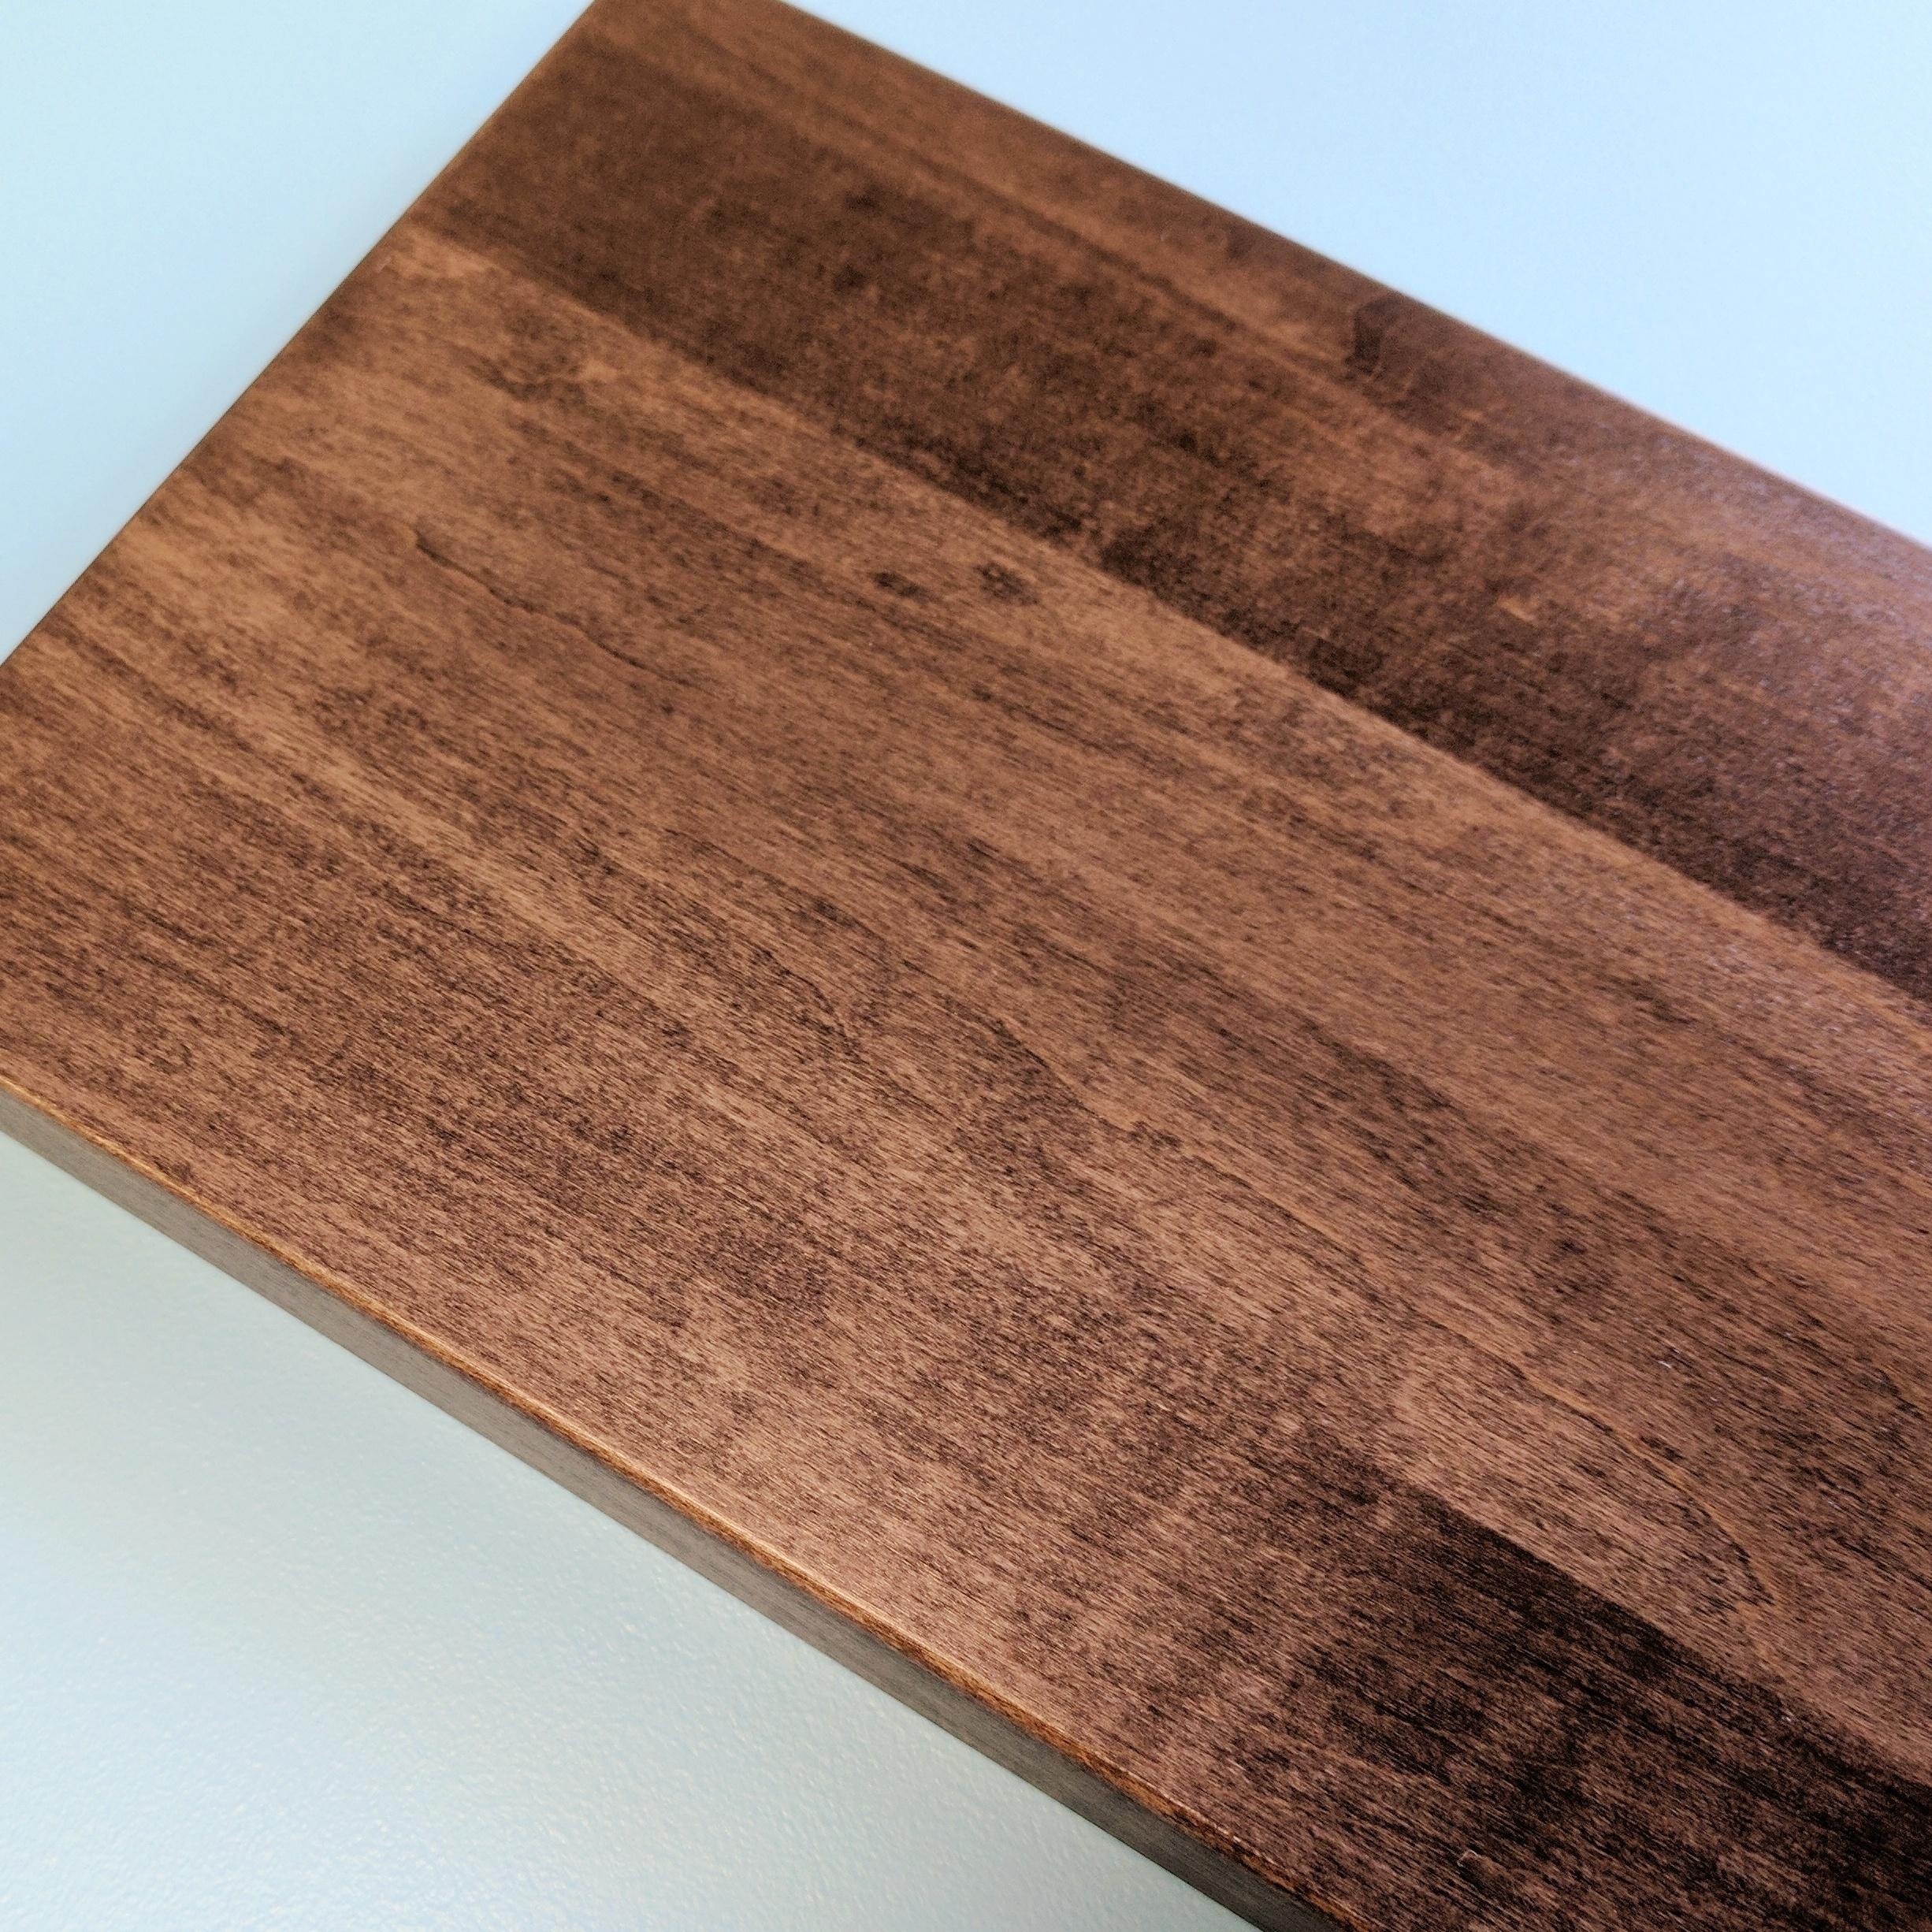 Good Prep Wood-699526-edited.jpg